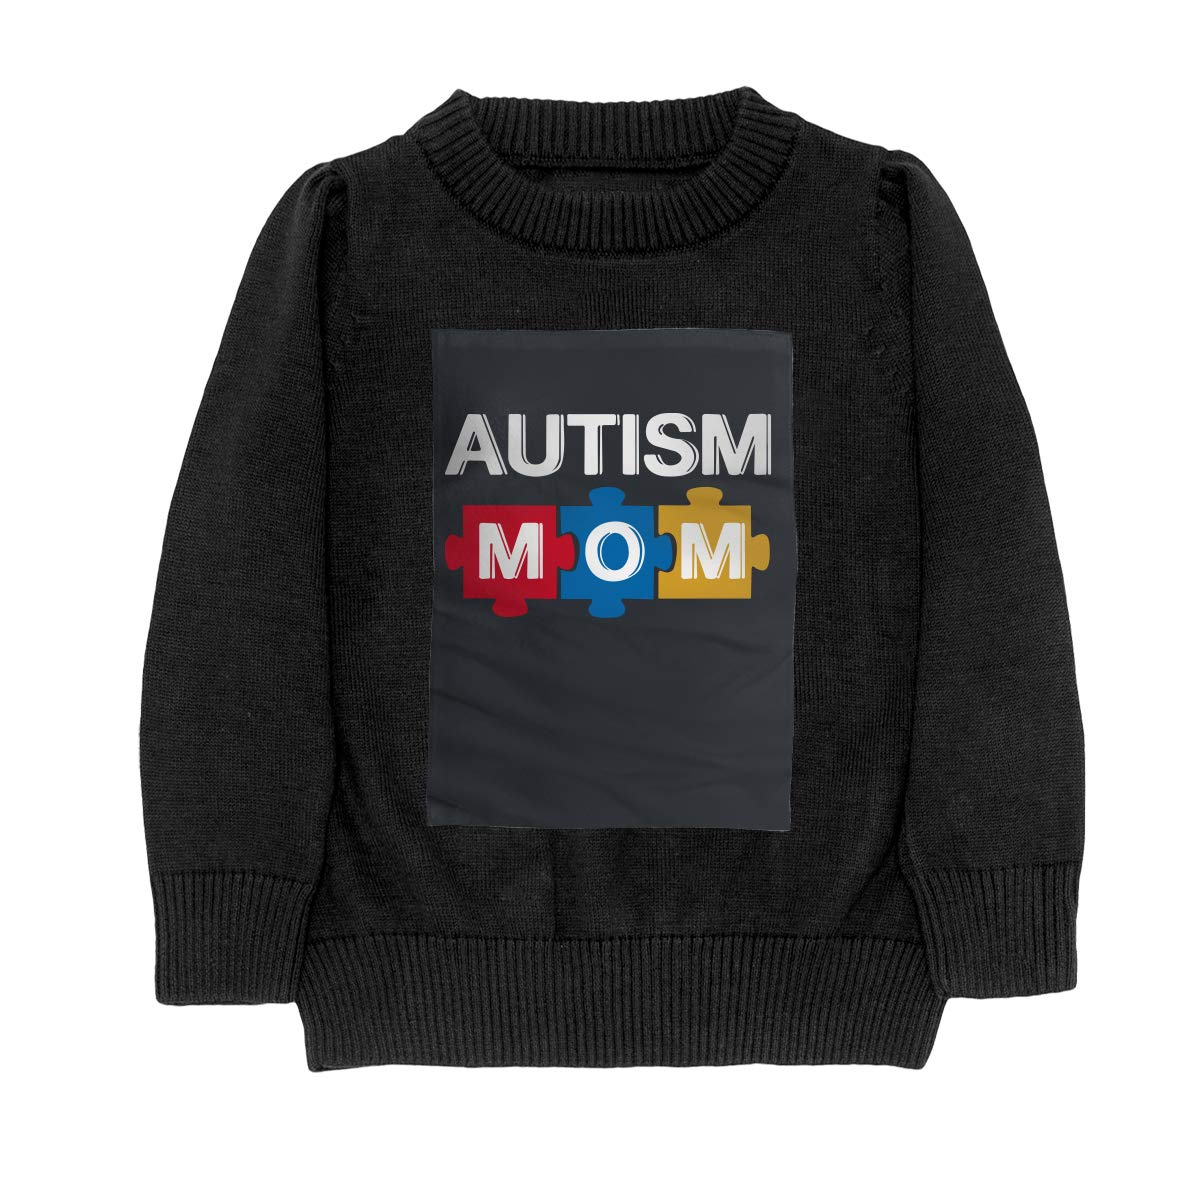 WWTBBJ-B Autism Mom Awareness Fashion Adolescent Boys /& Girls Unisex Sweater Keep Warm